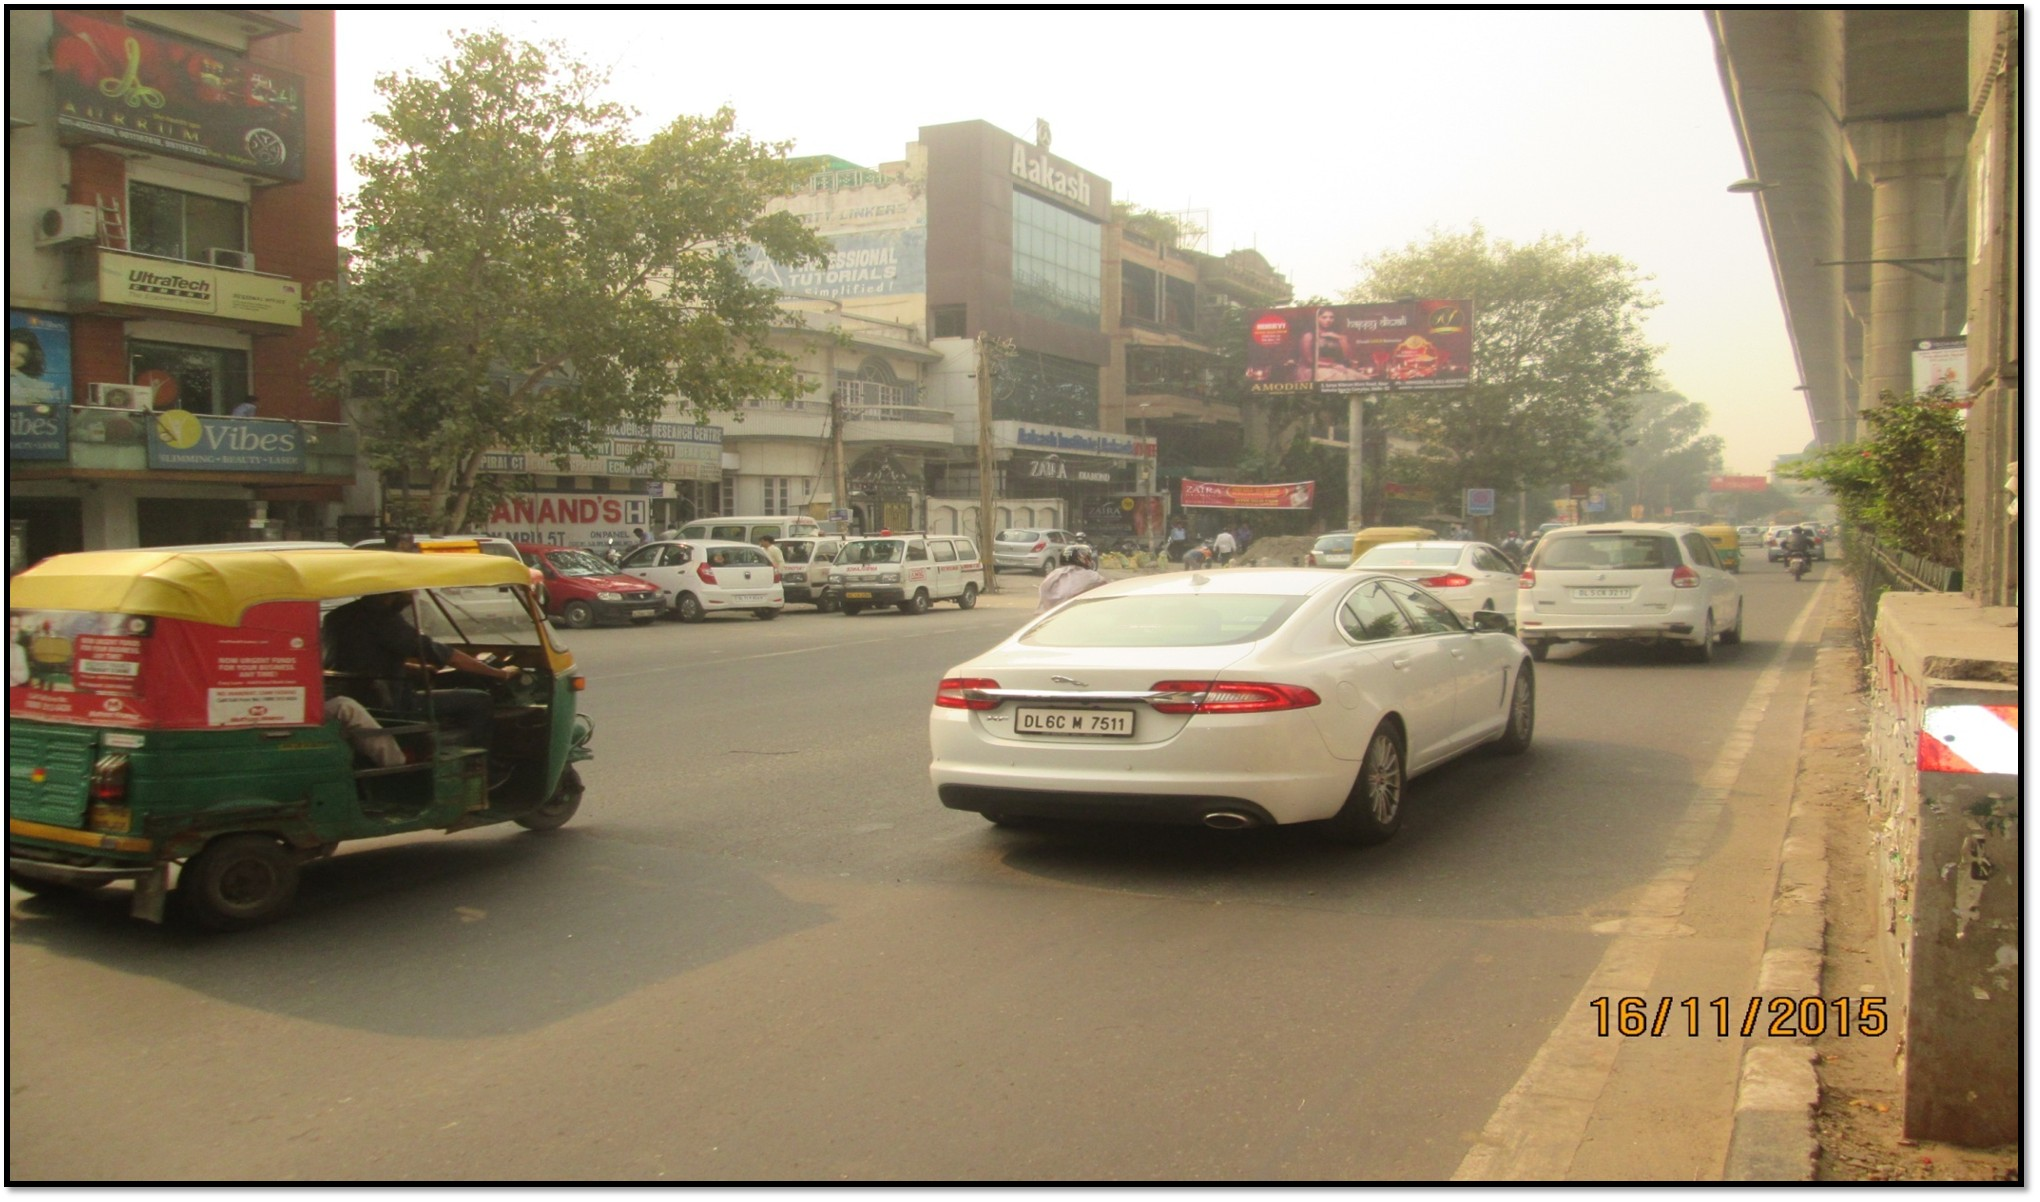 Preet vihar, Vikas Marg, New Delhi